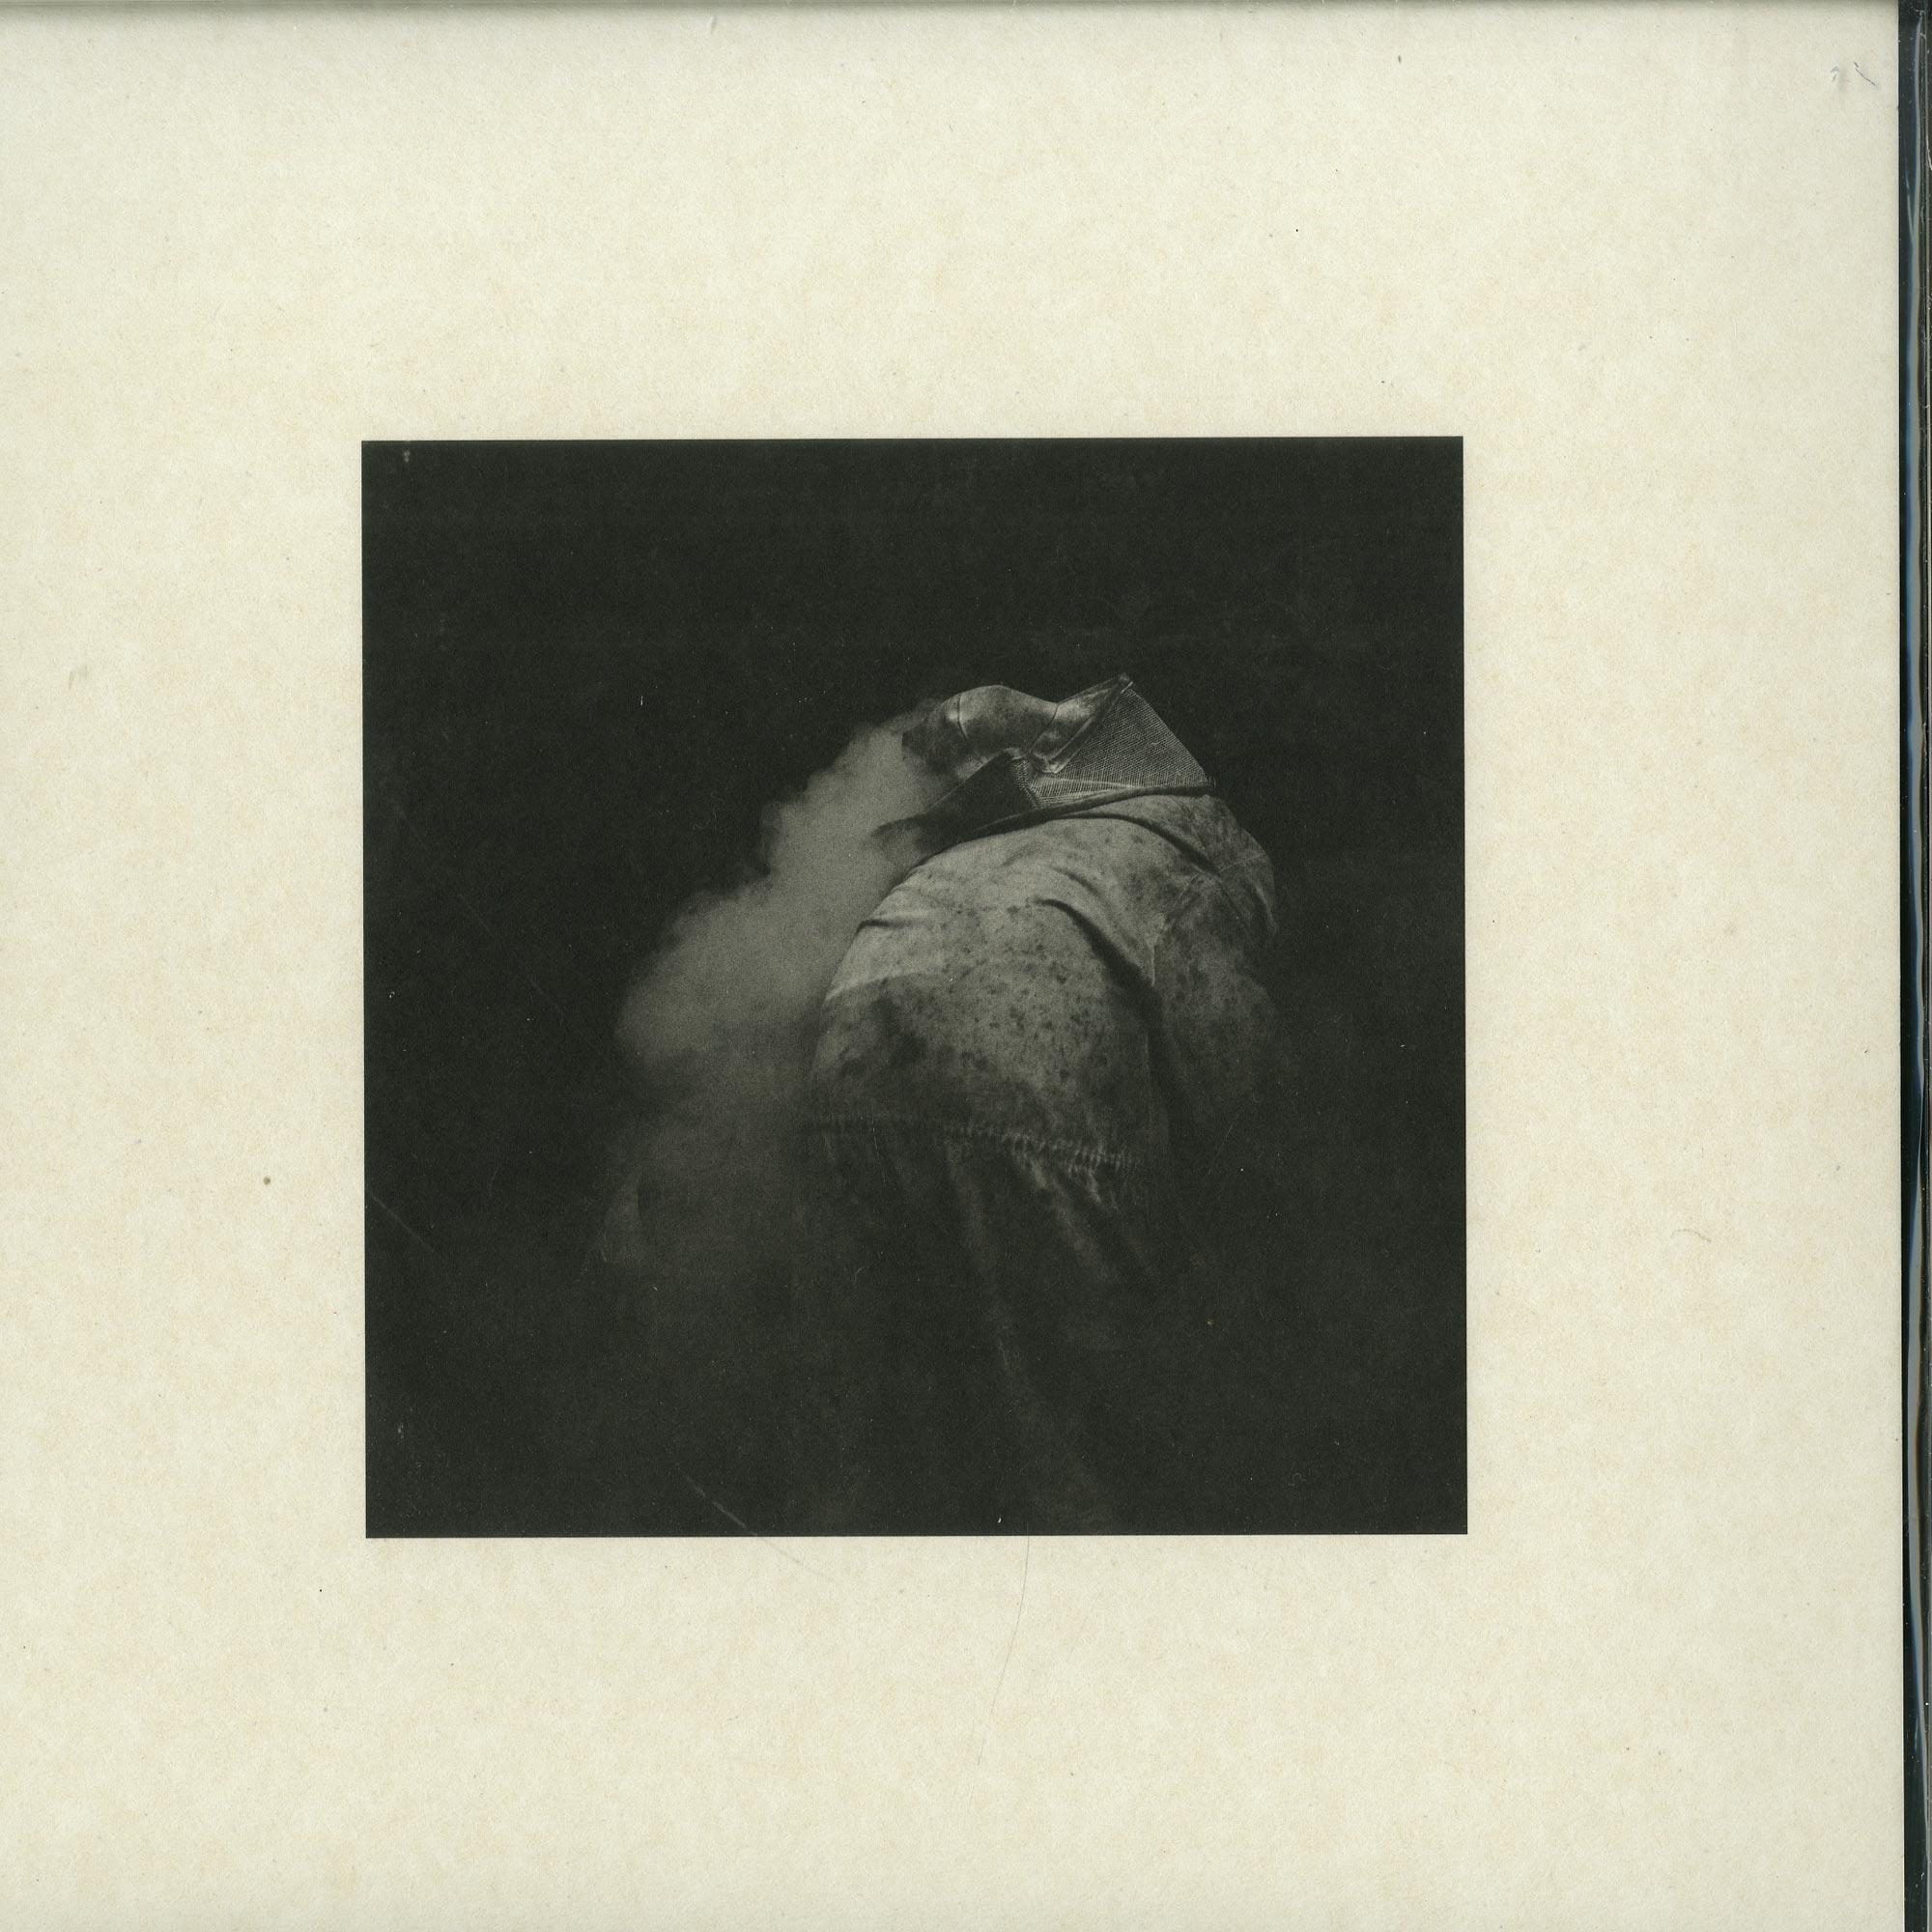 Stereociti - CONSTANT TURBULENT RIOT EP